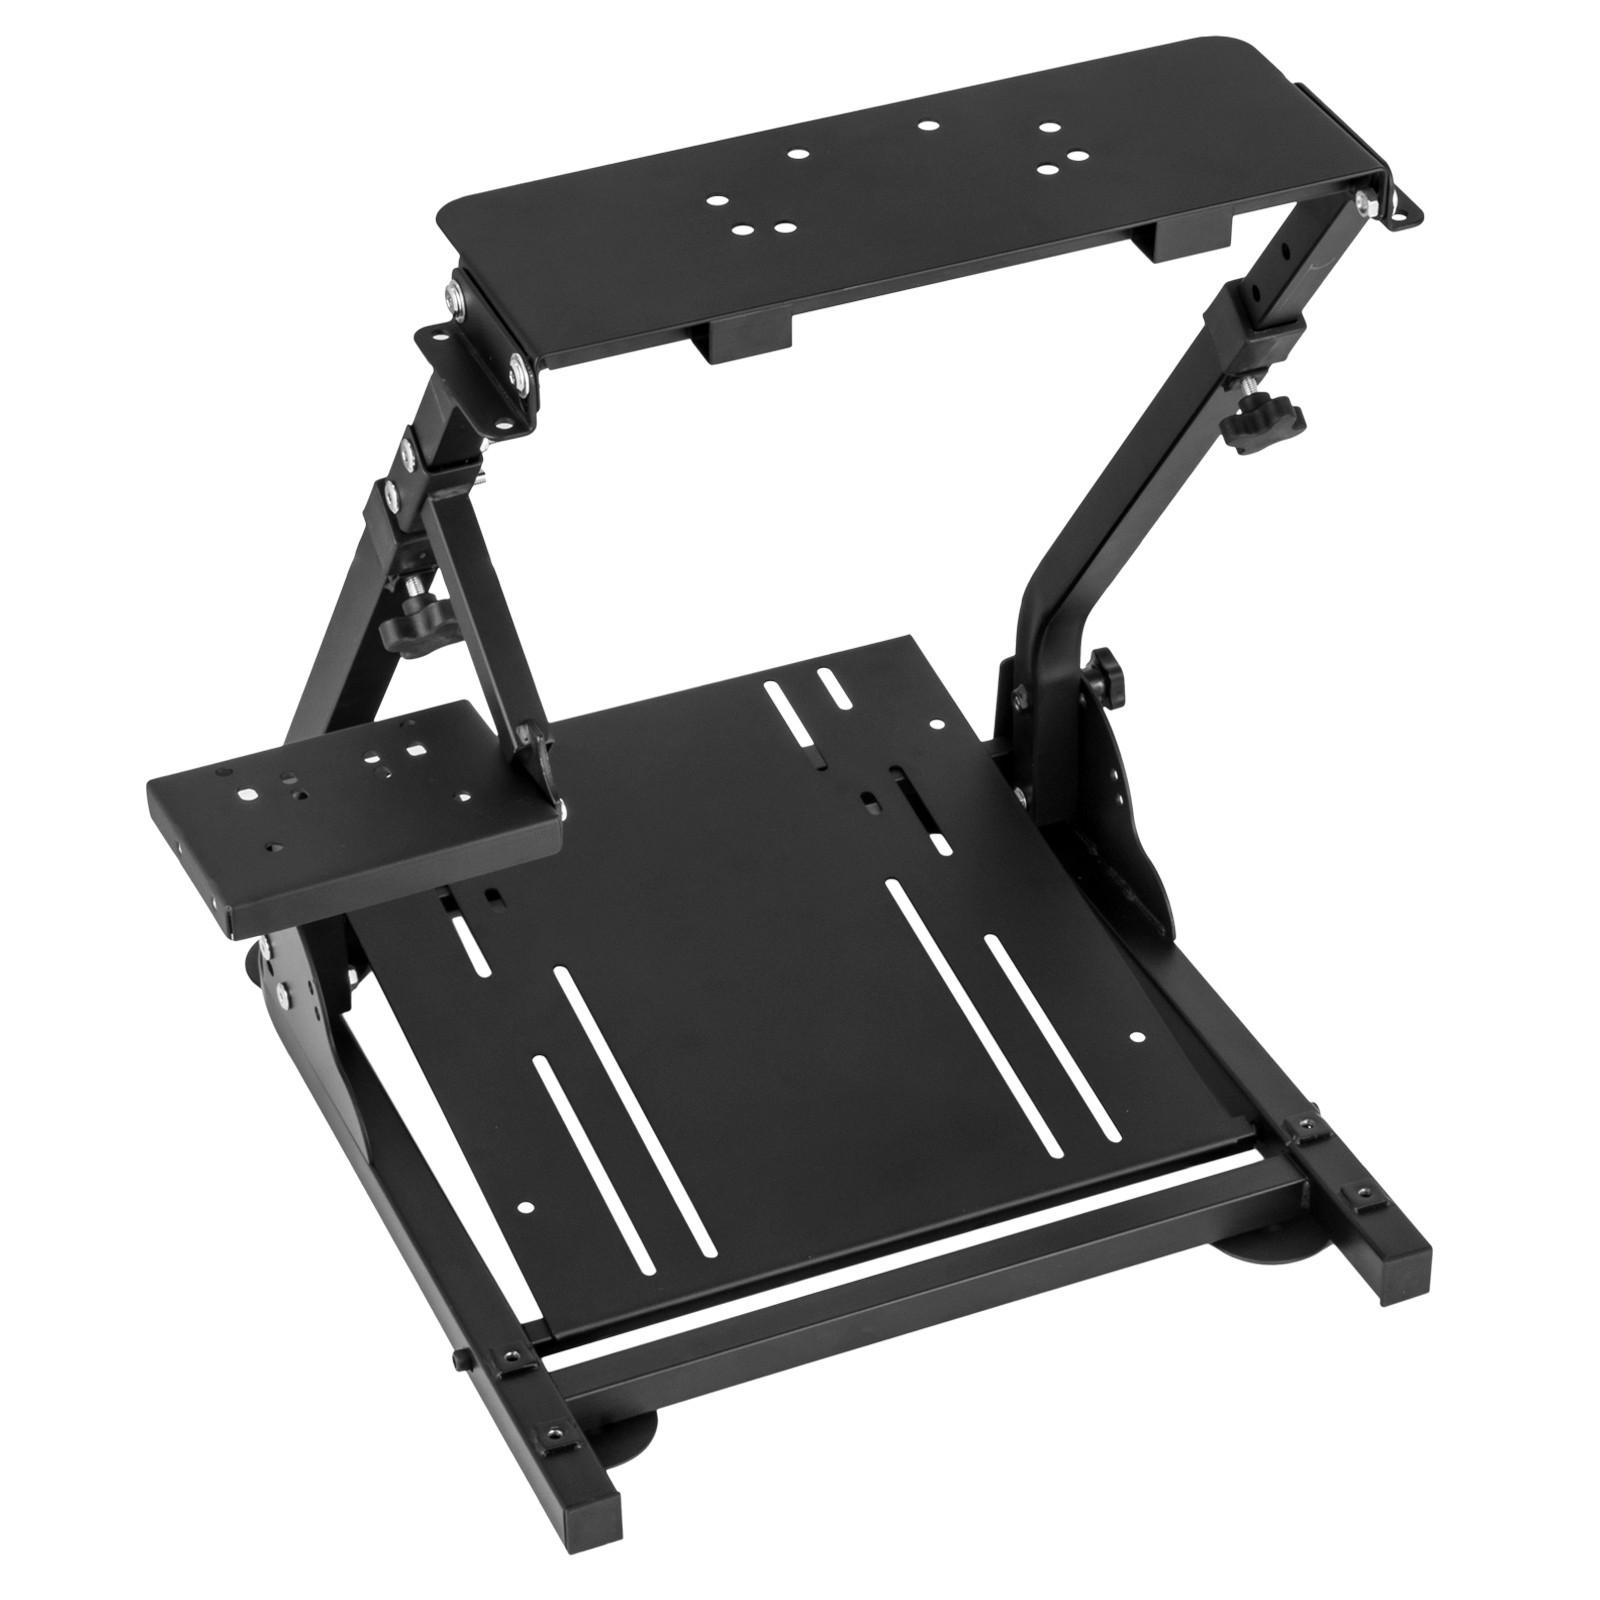 racing simulator steering wheel stand logitech g920. Black Bedroom Furniture Sets. Home Design Ideas